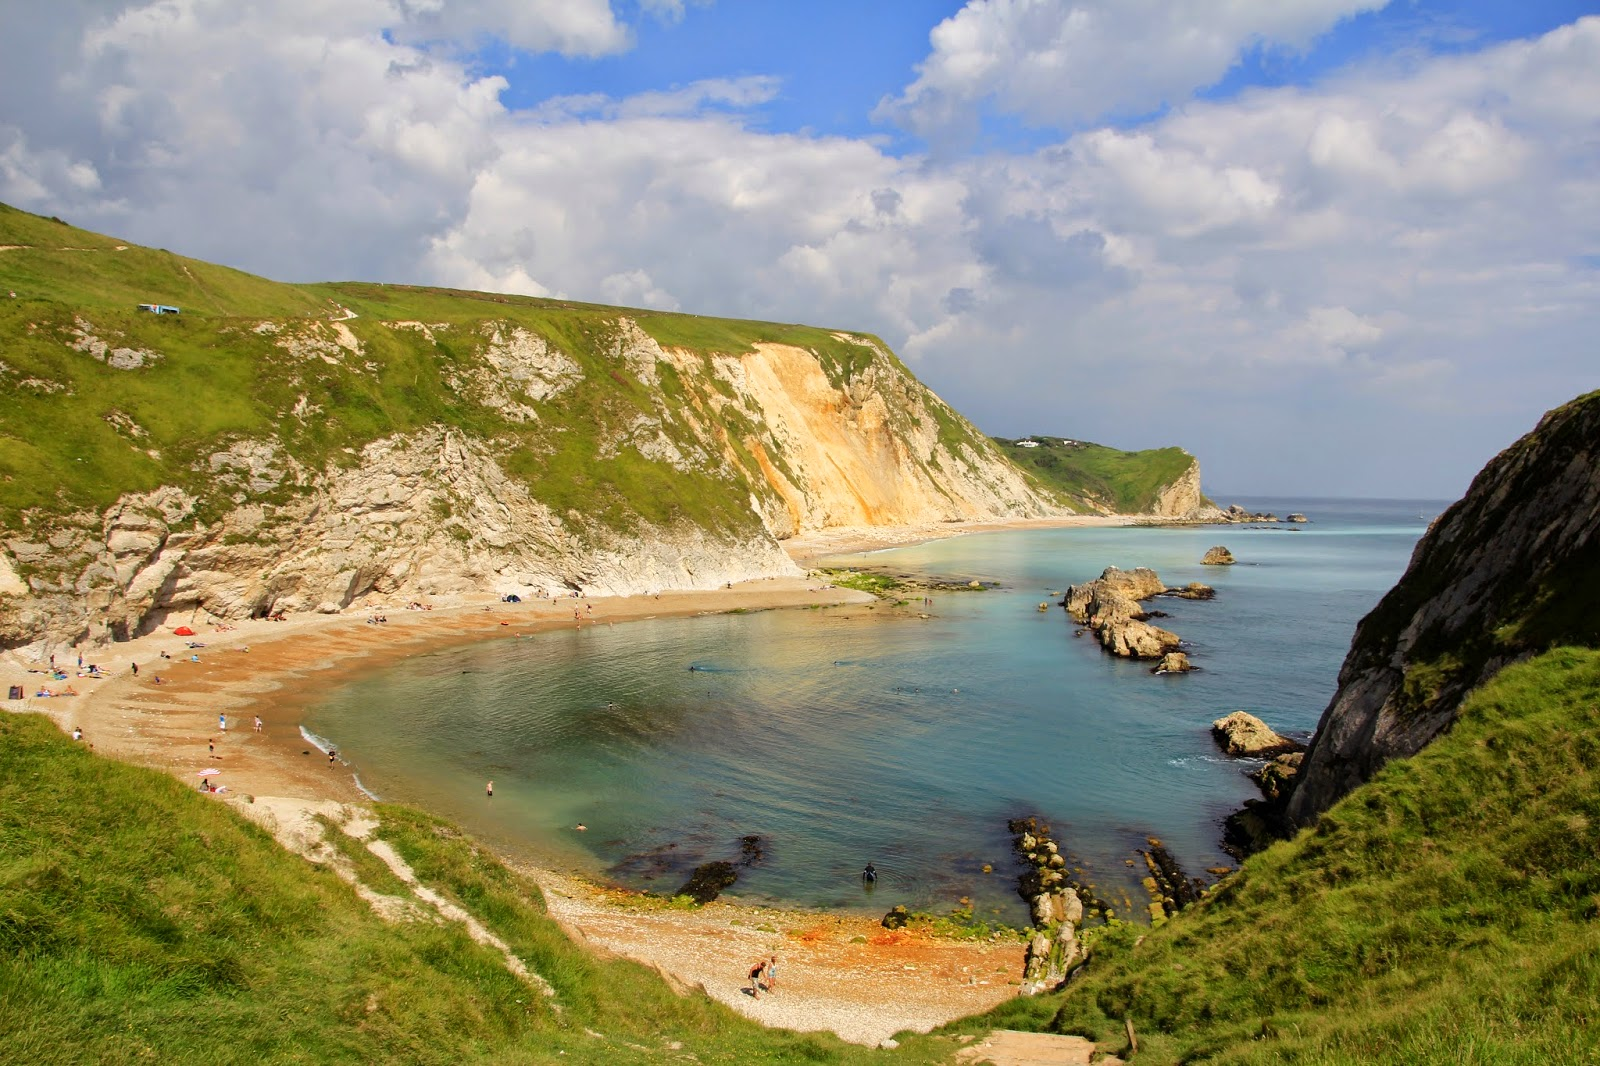 Lulworth, Dorset